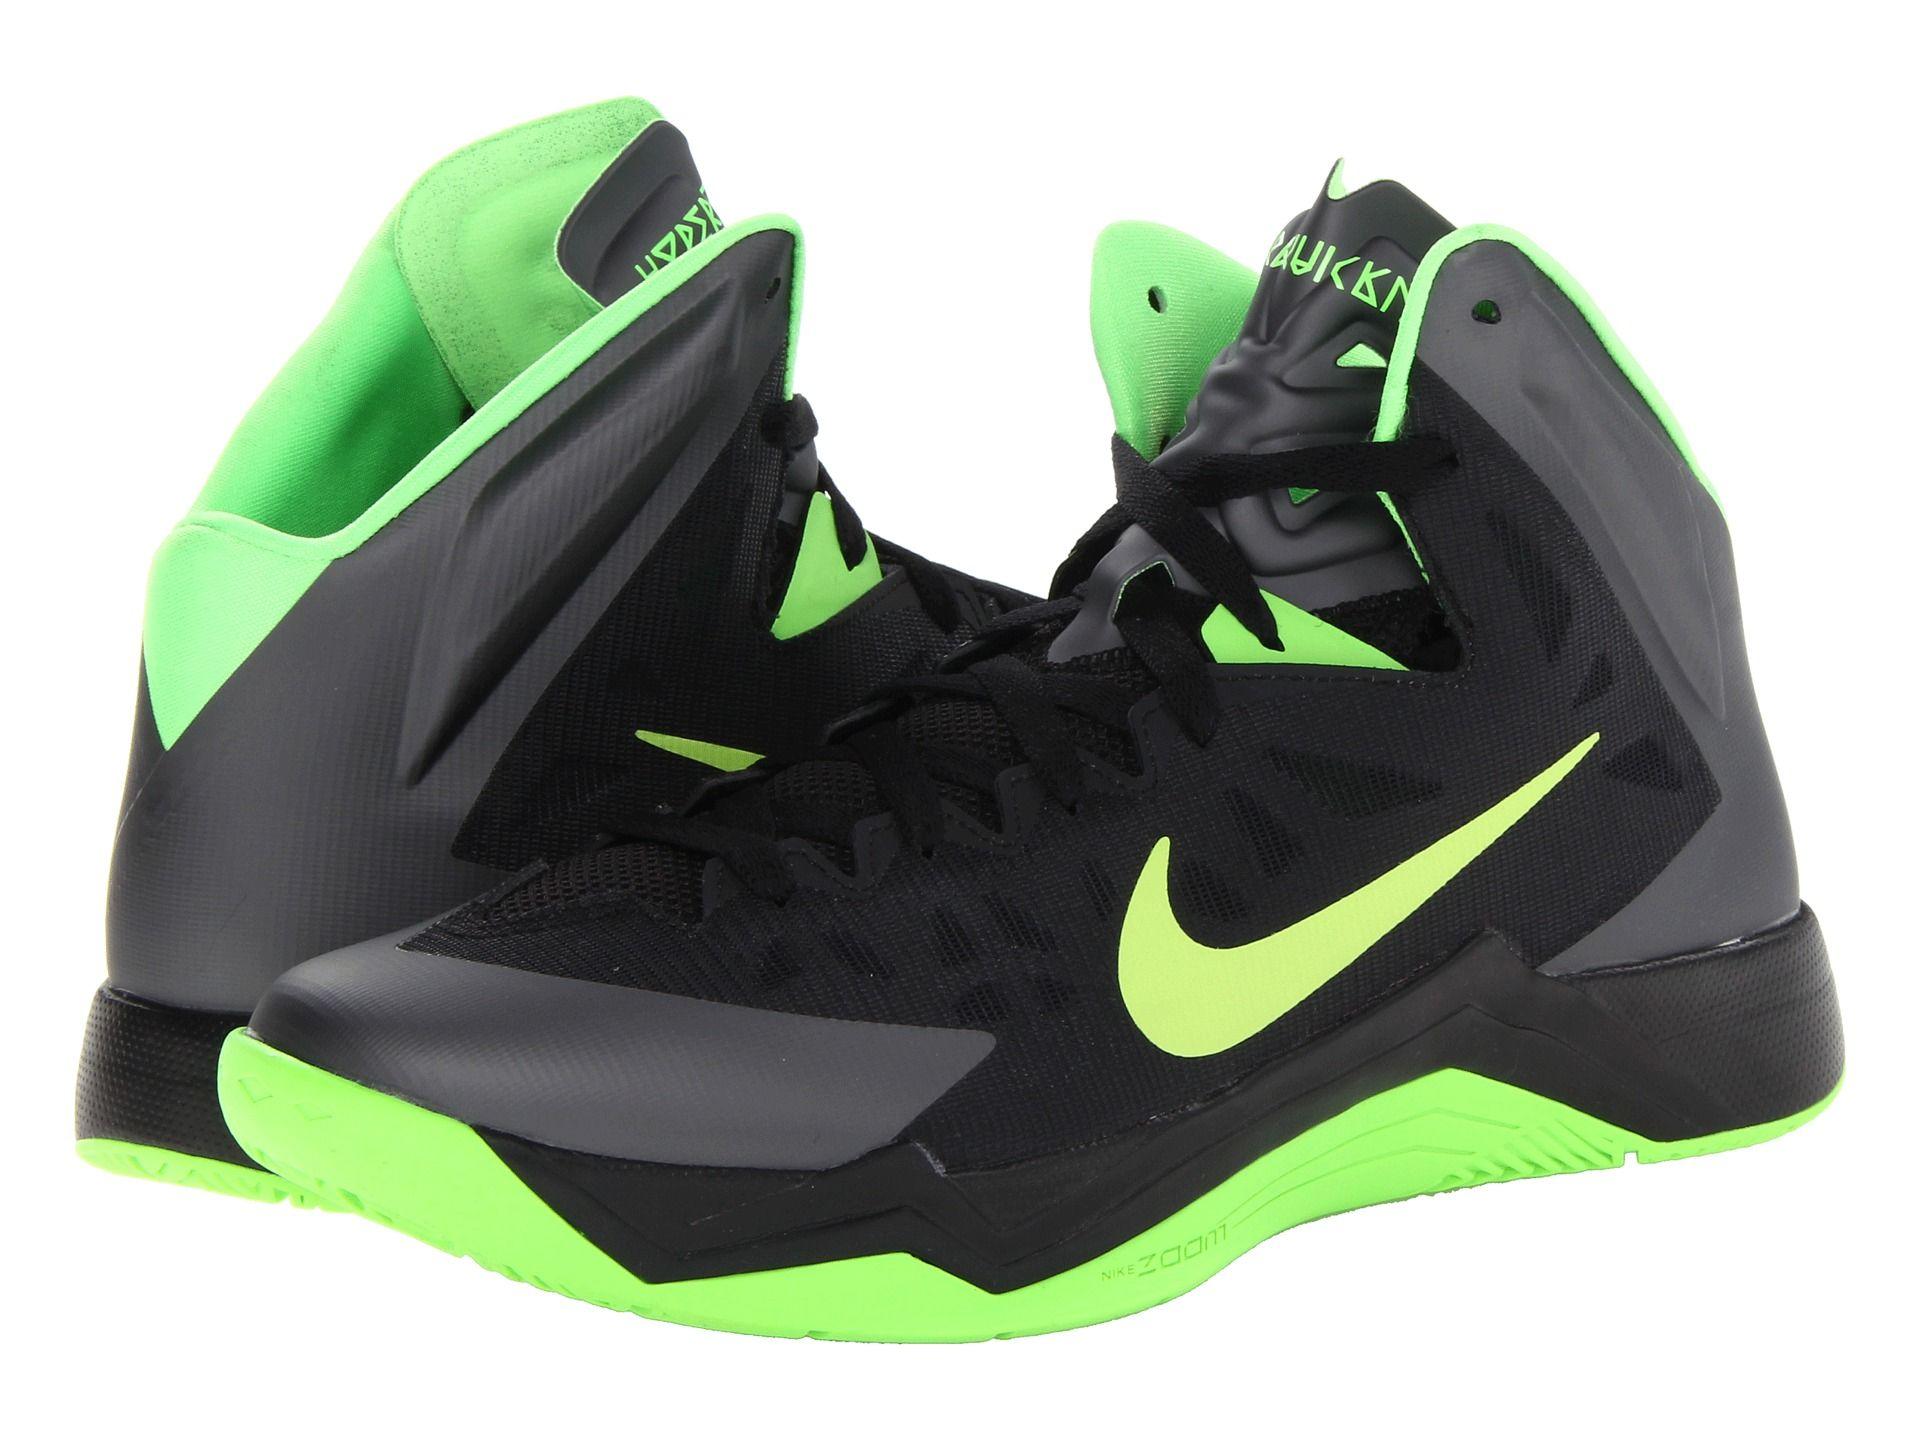 Nike Hyper Quickness Sneakers - #Nike #Sneakers